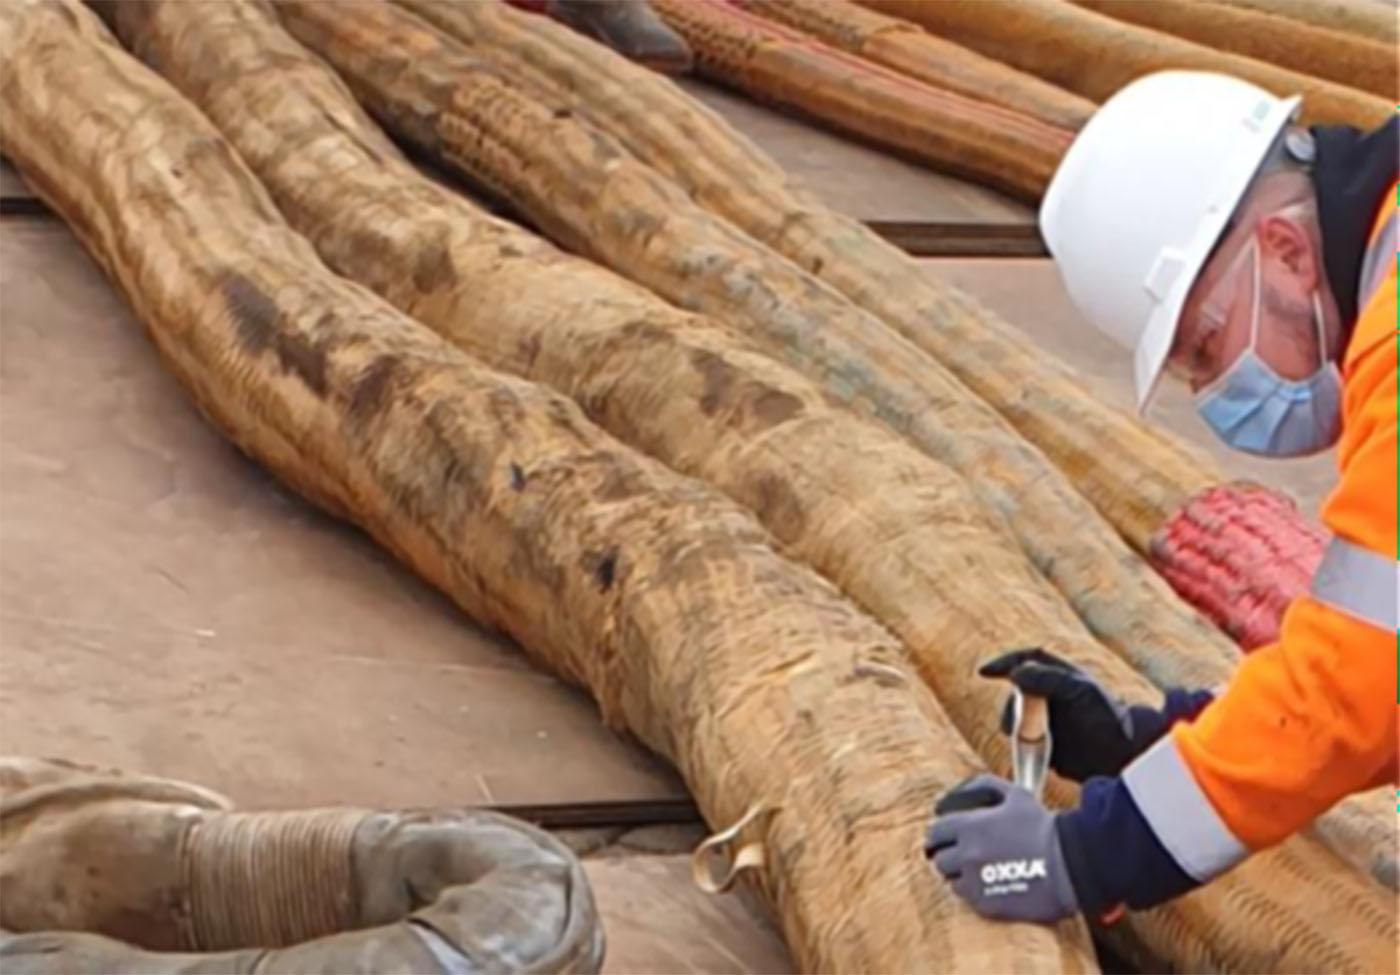 inspection of heavy lift slings